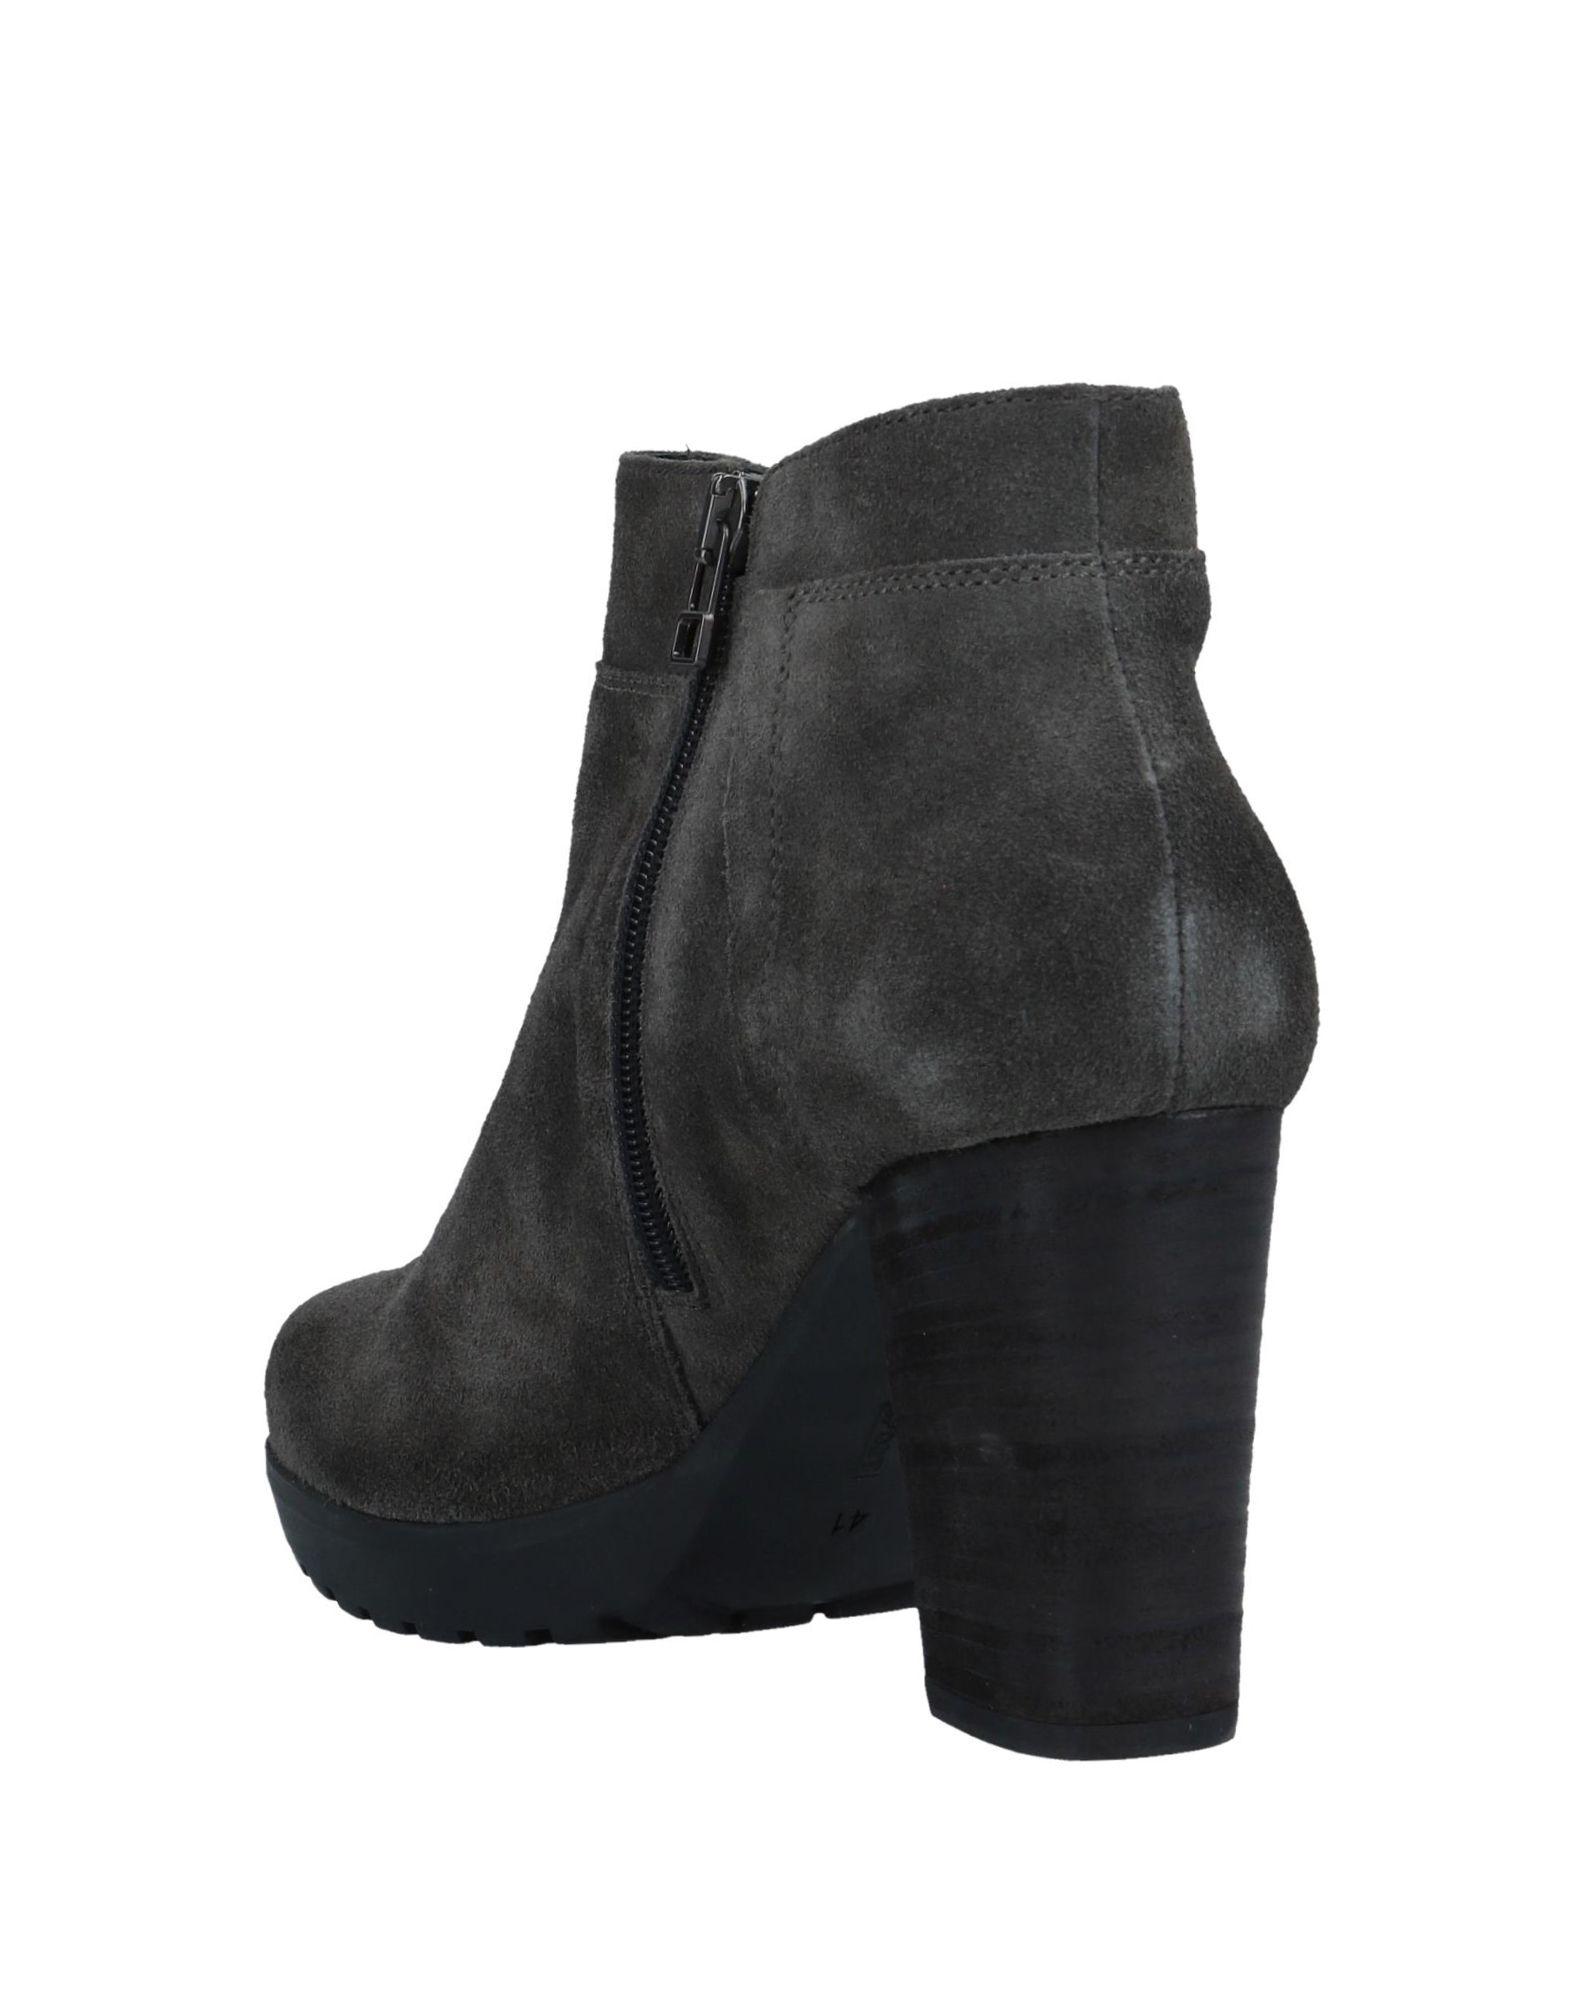 Janet Sport Stiefelette Damen  Schuhe 11548253DU Gute Qualität beliebte Schuhe  bb014b